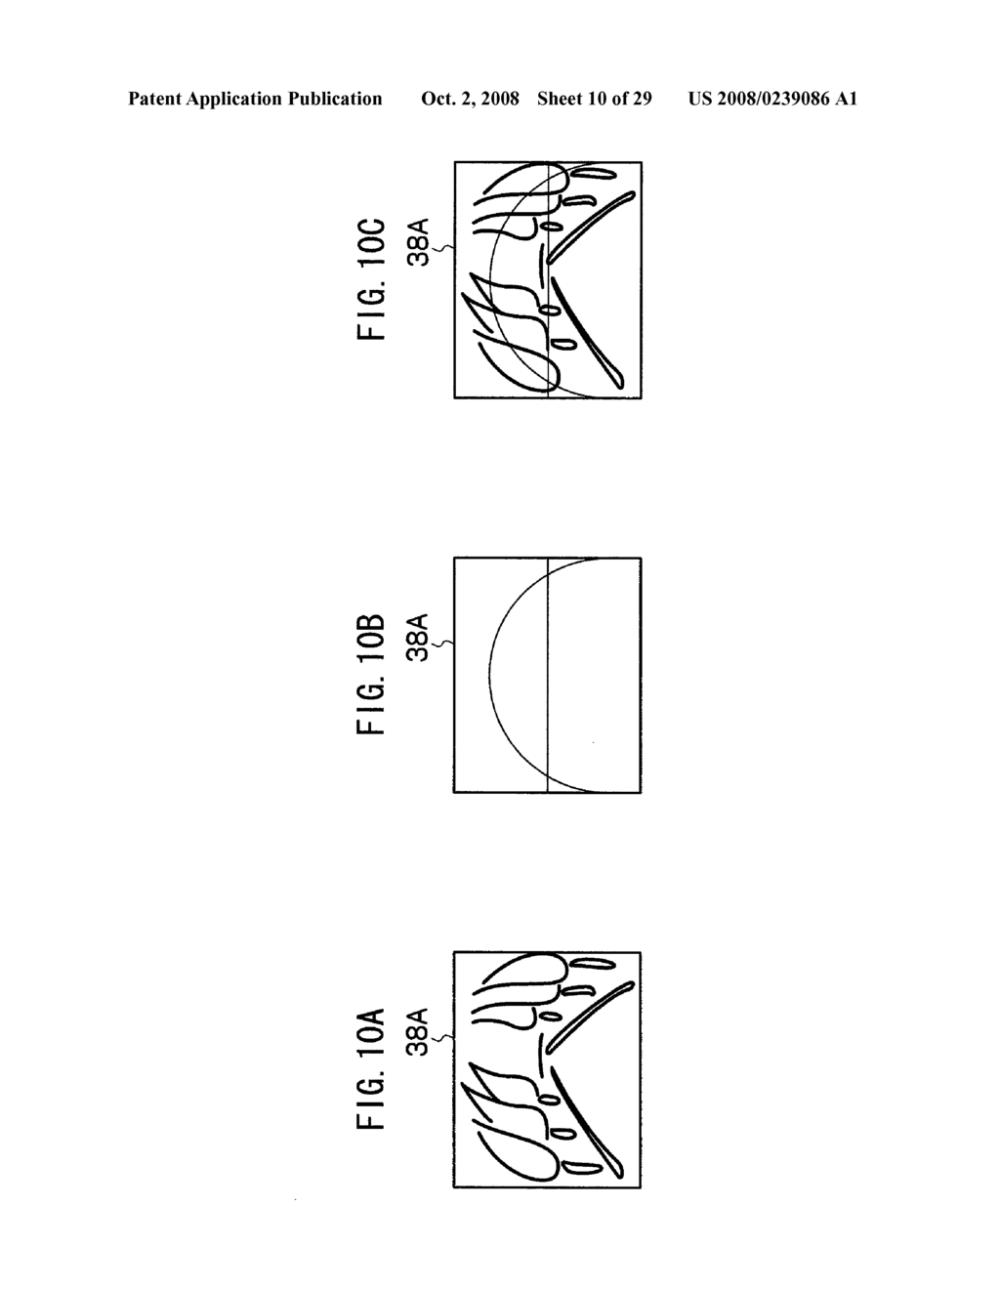 medium resolution of digital camera digital camera control process and storage medium storing control program diagram schematic and image 11